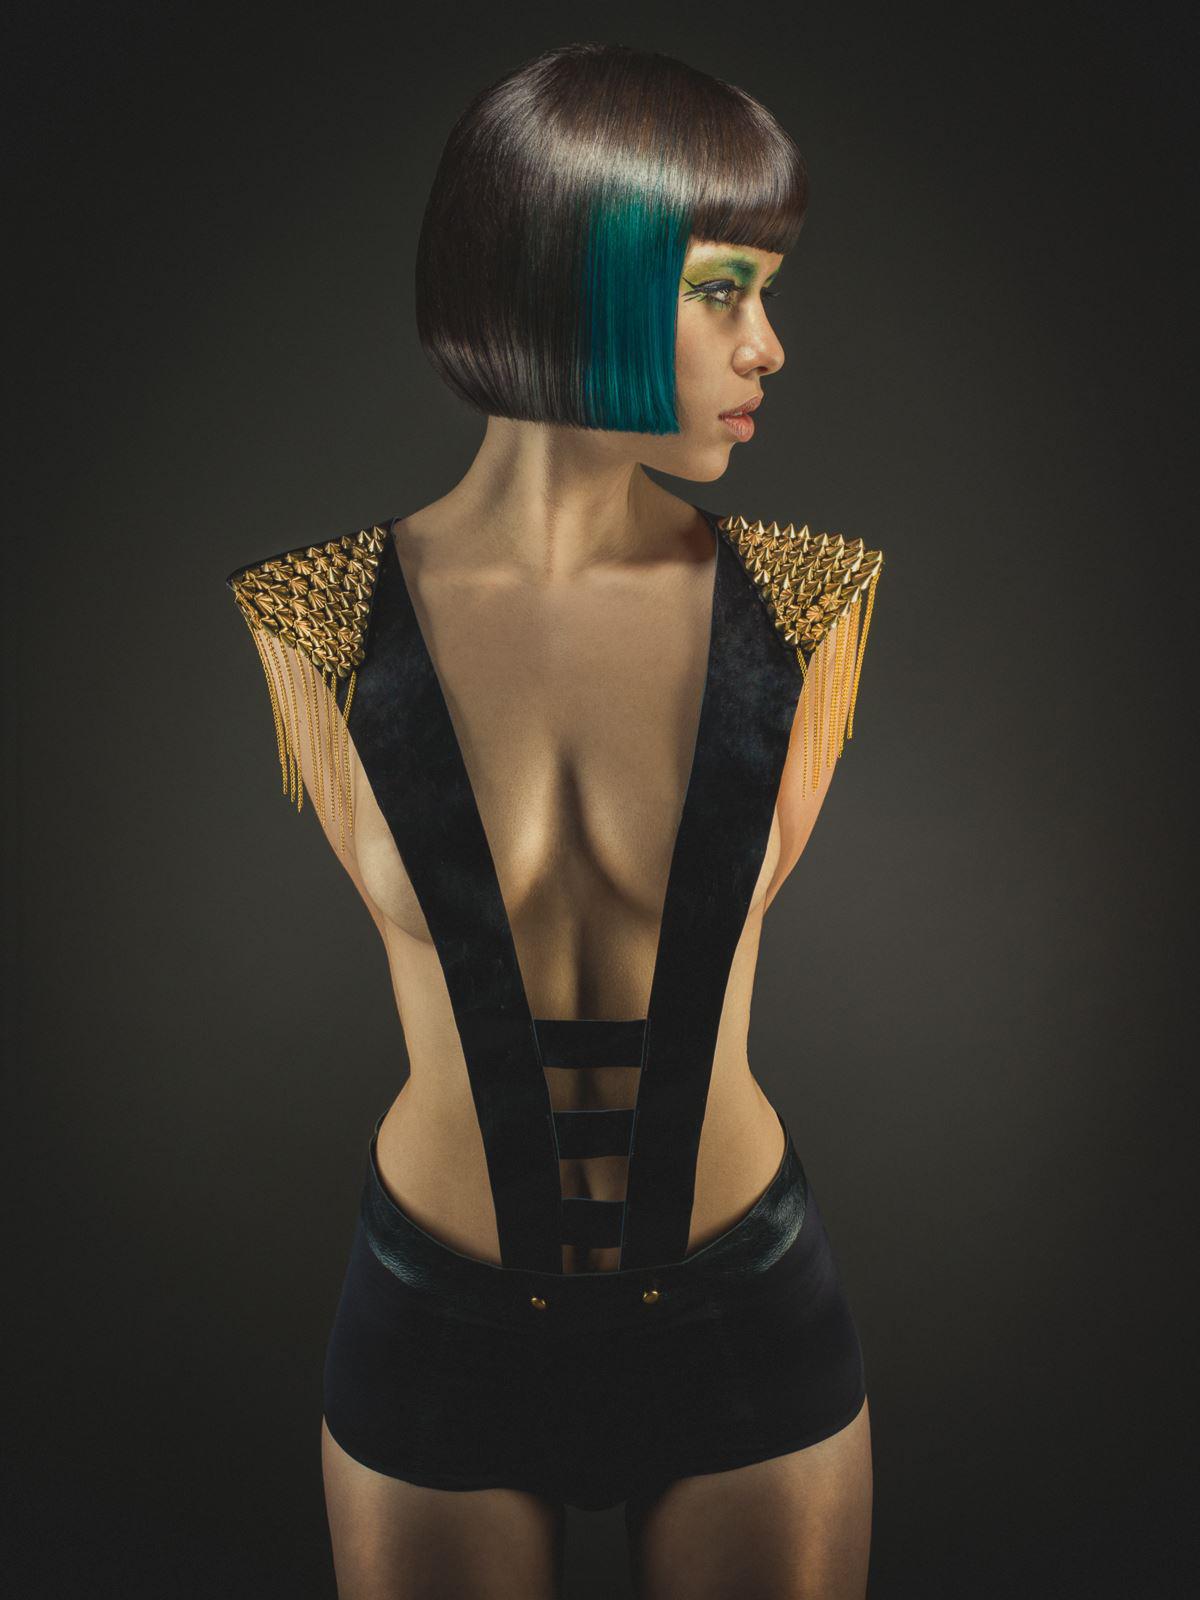 Duy Ha Minh - Joanna Bounamous - makeup Alex Marjolaine Mazens - stylist Owlee Styliste - designer Pierre Ginsburg